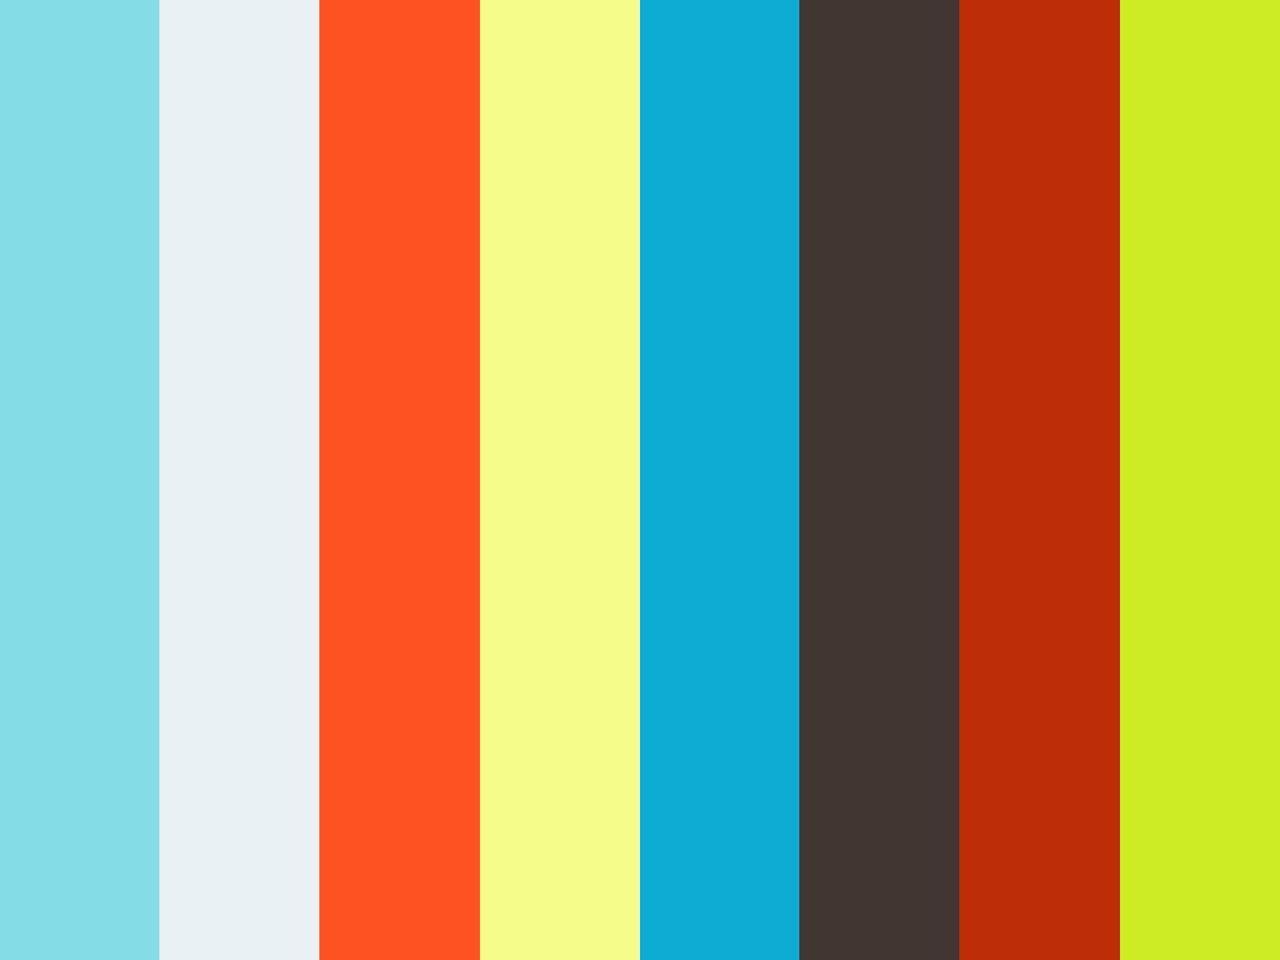 d1 300 - 1630 - Success of the One Georgia Tech Redesign - Eric Sembrat on Vimeo